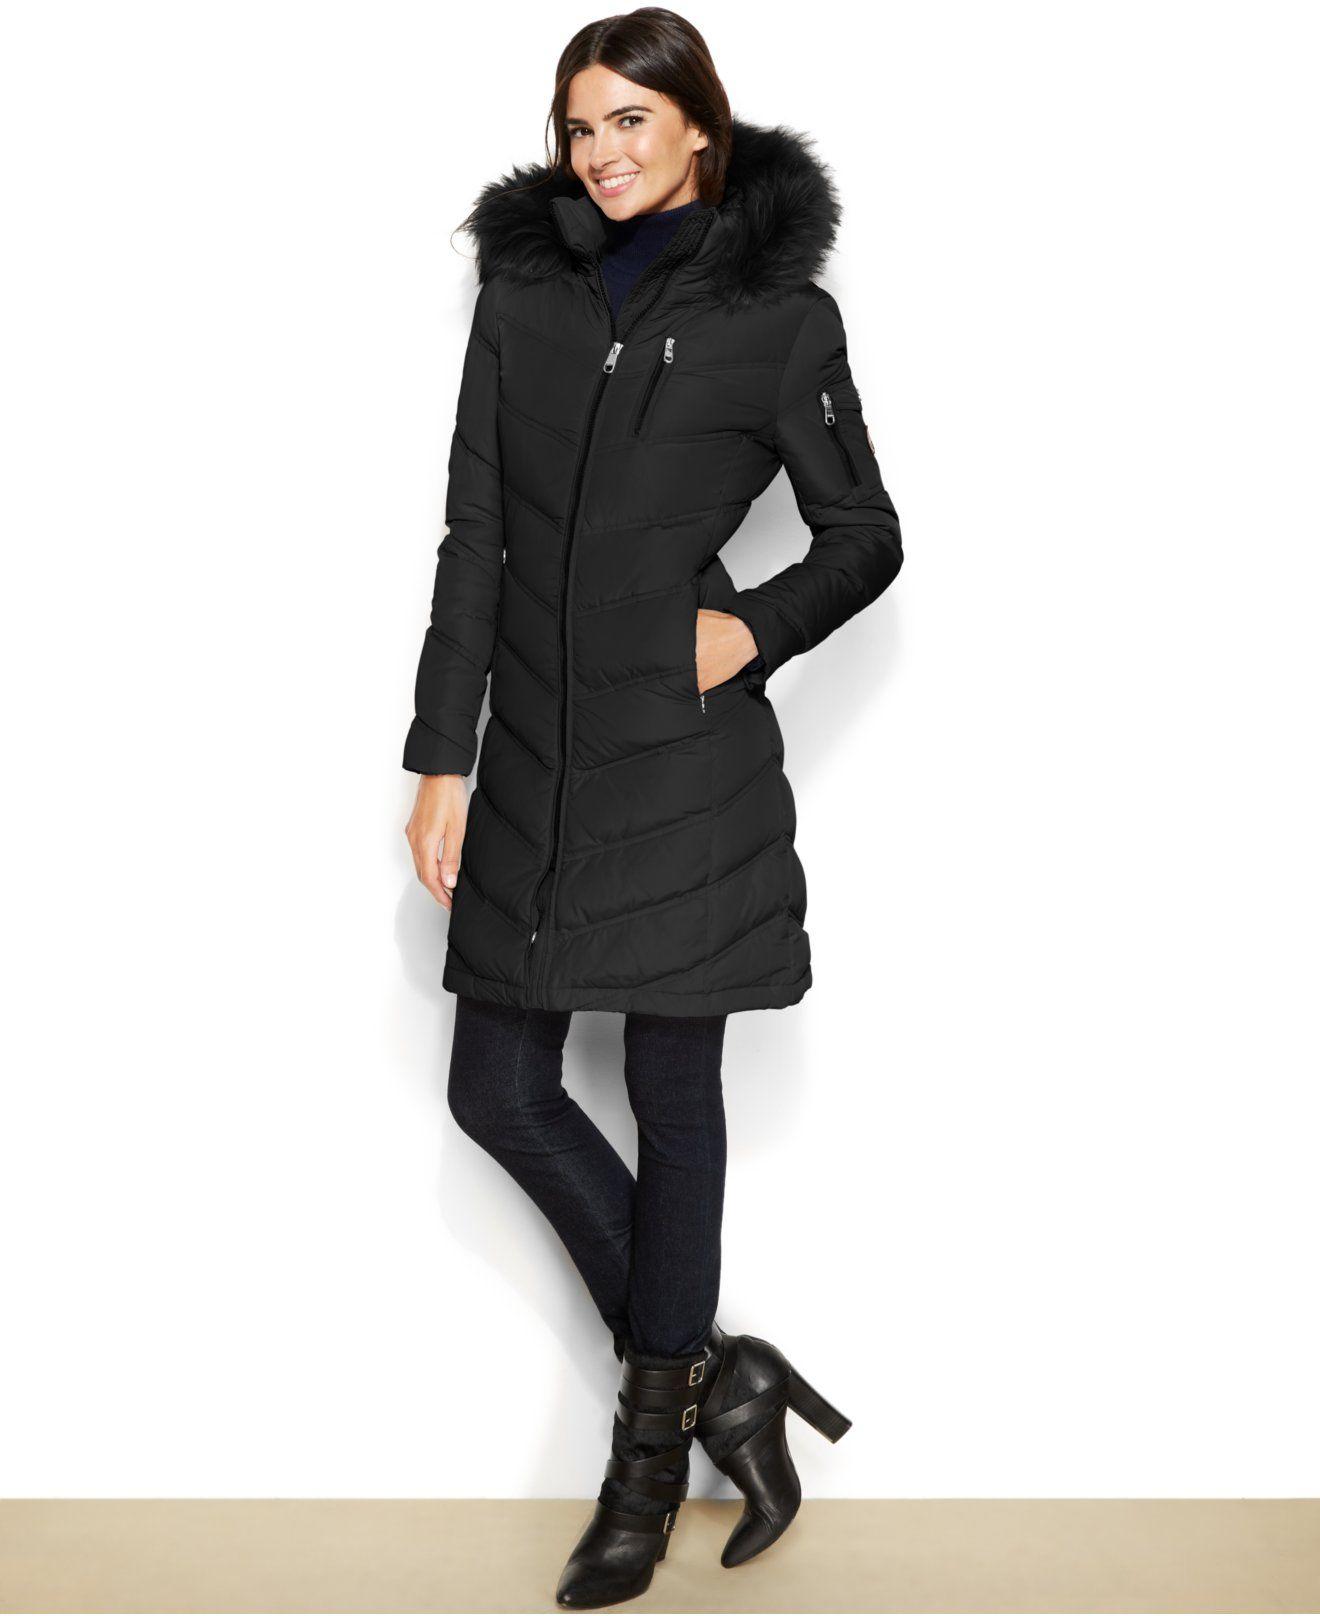 c09d8561d8 Calvin Klein Faux-Fur-Trimmed Hooded Down Coat - Coats - Women - Macy's